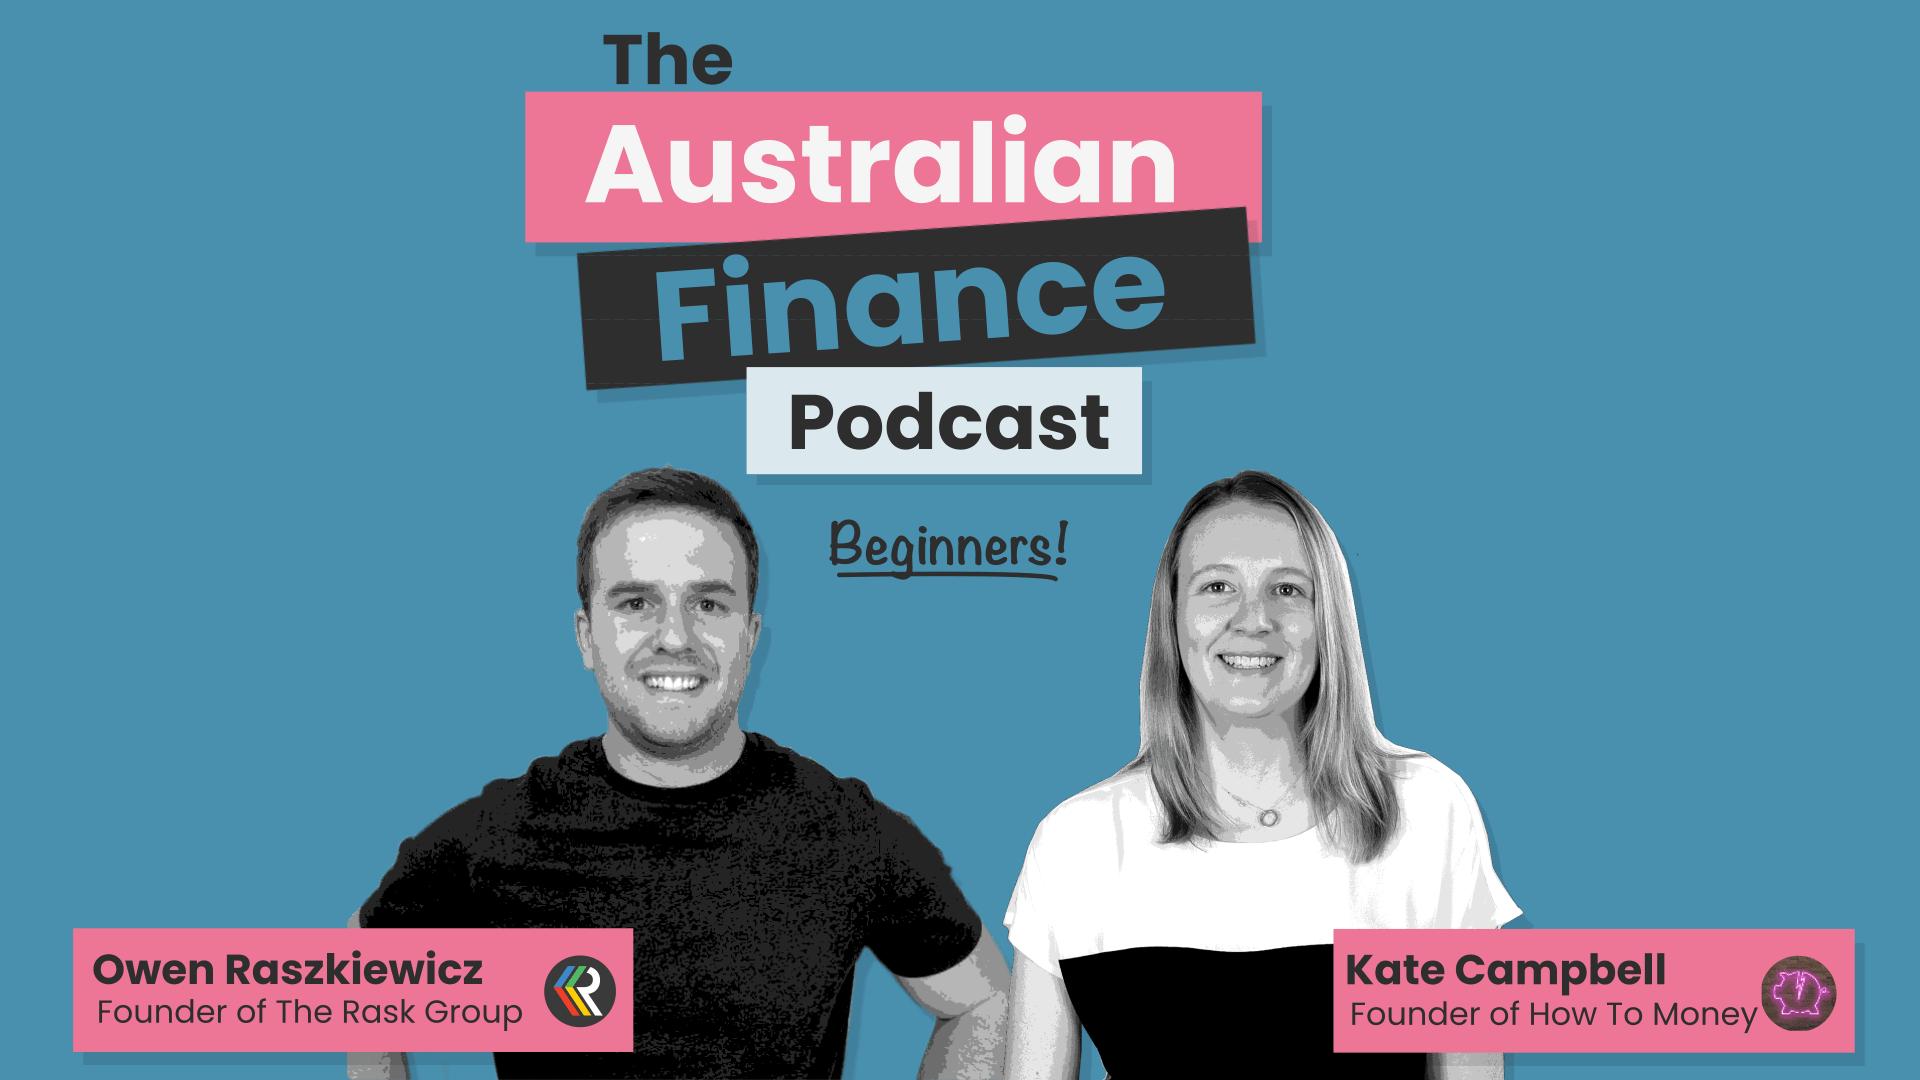 australian-finance-podcast-image